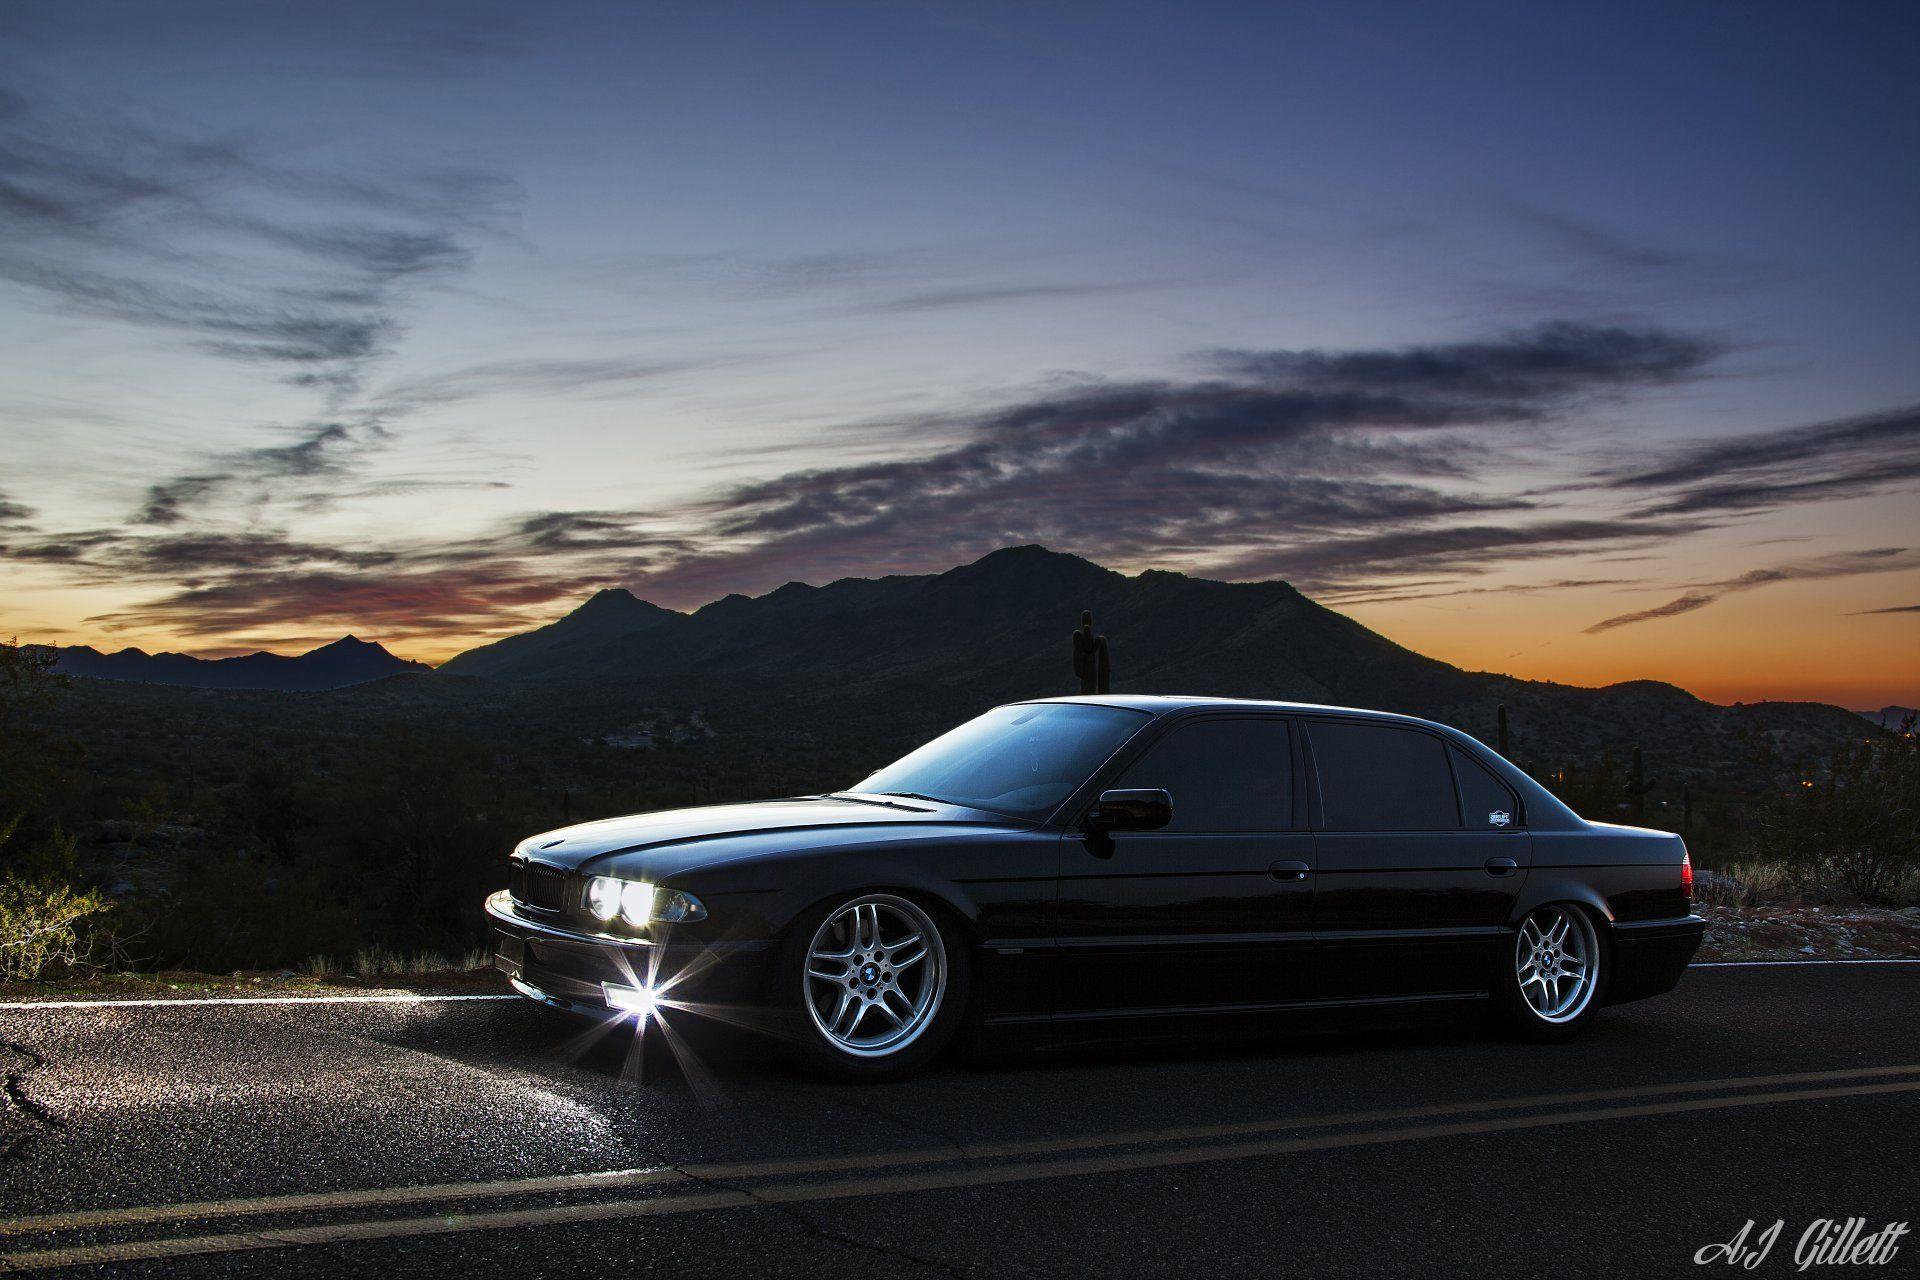 BMW E38 Wallpapers - Wallpaper Cave